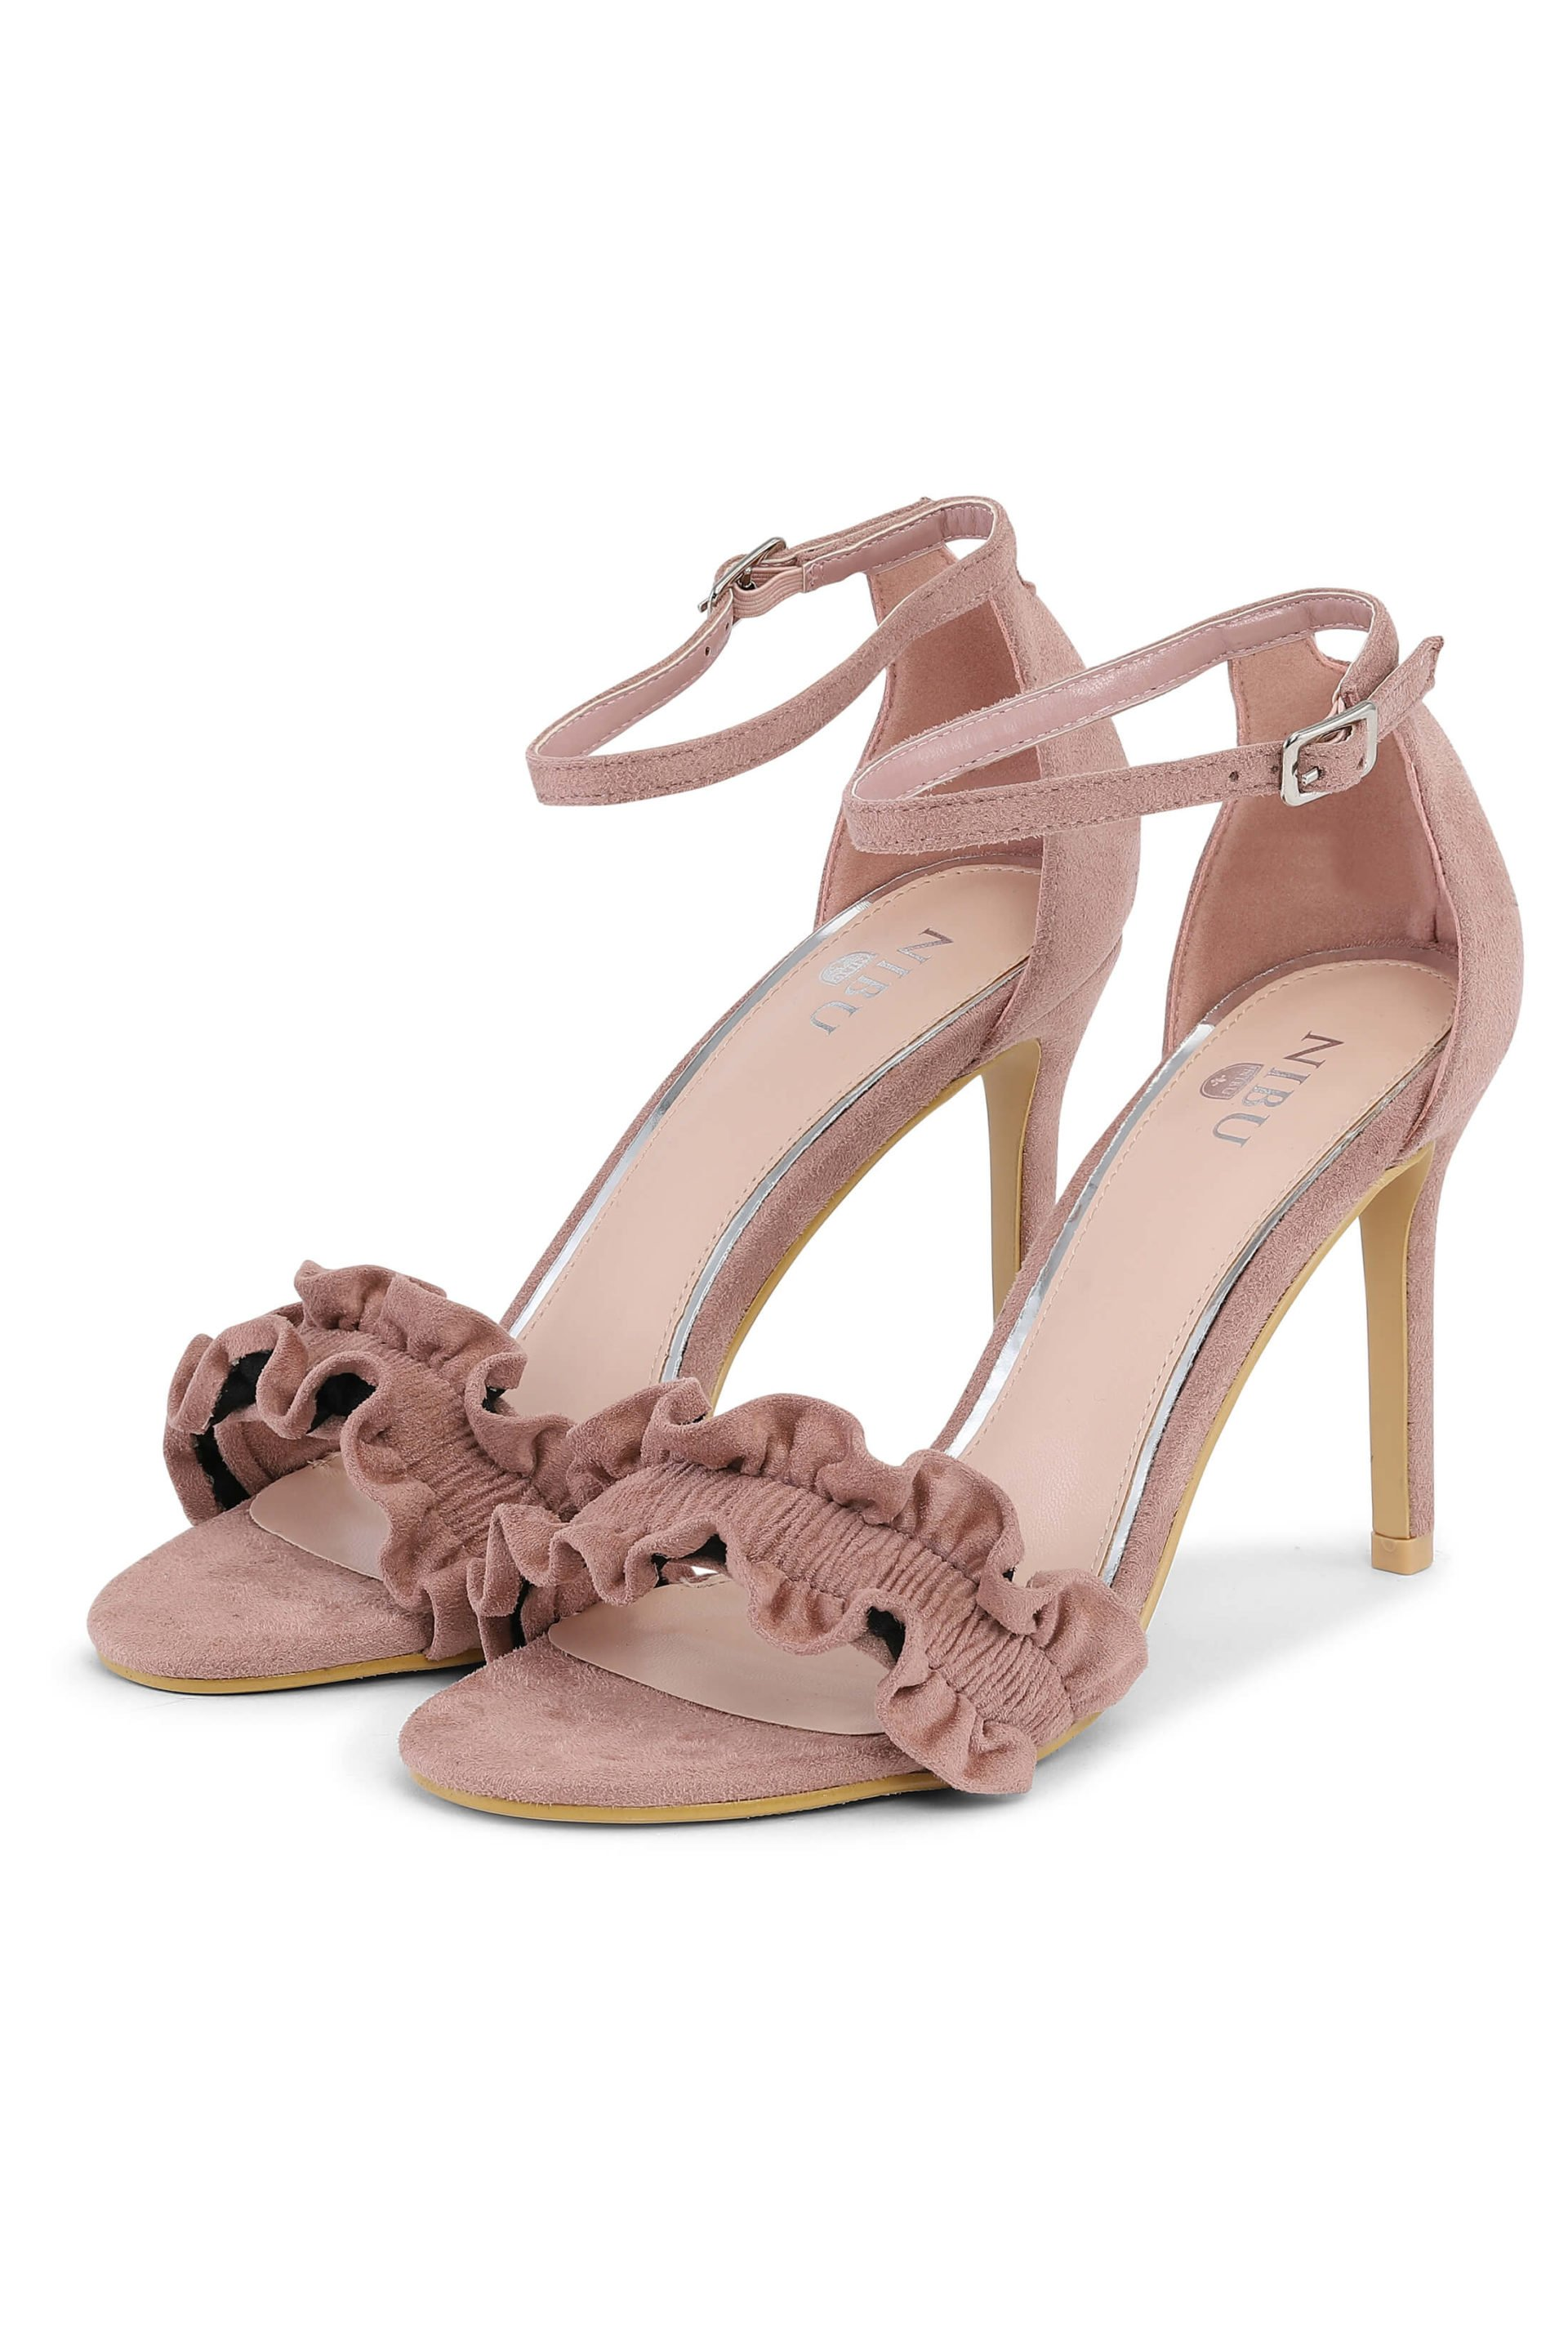 High heeled sunset beige sandal